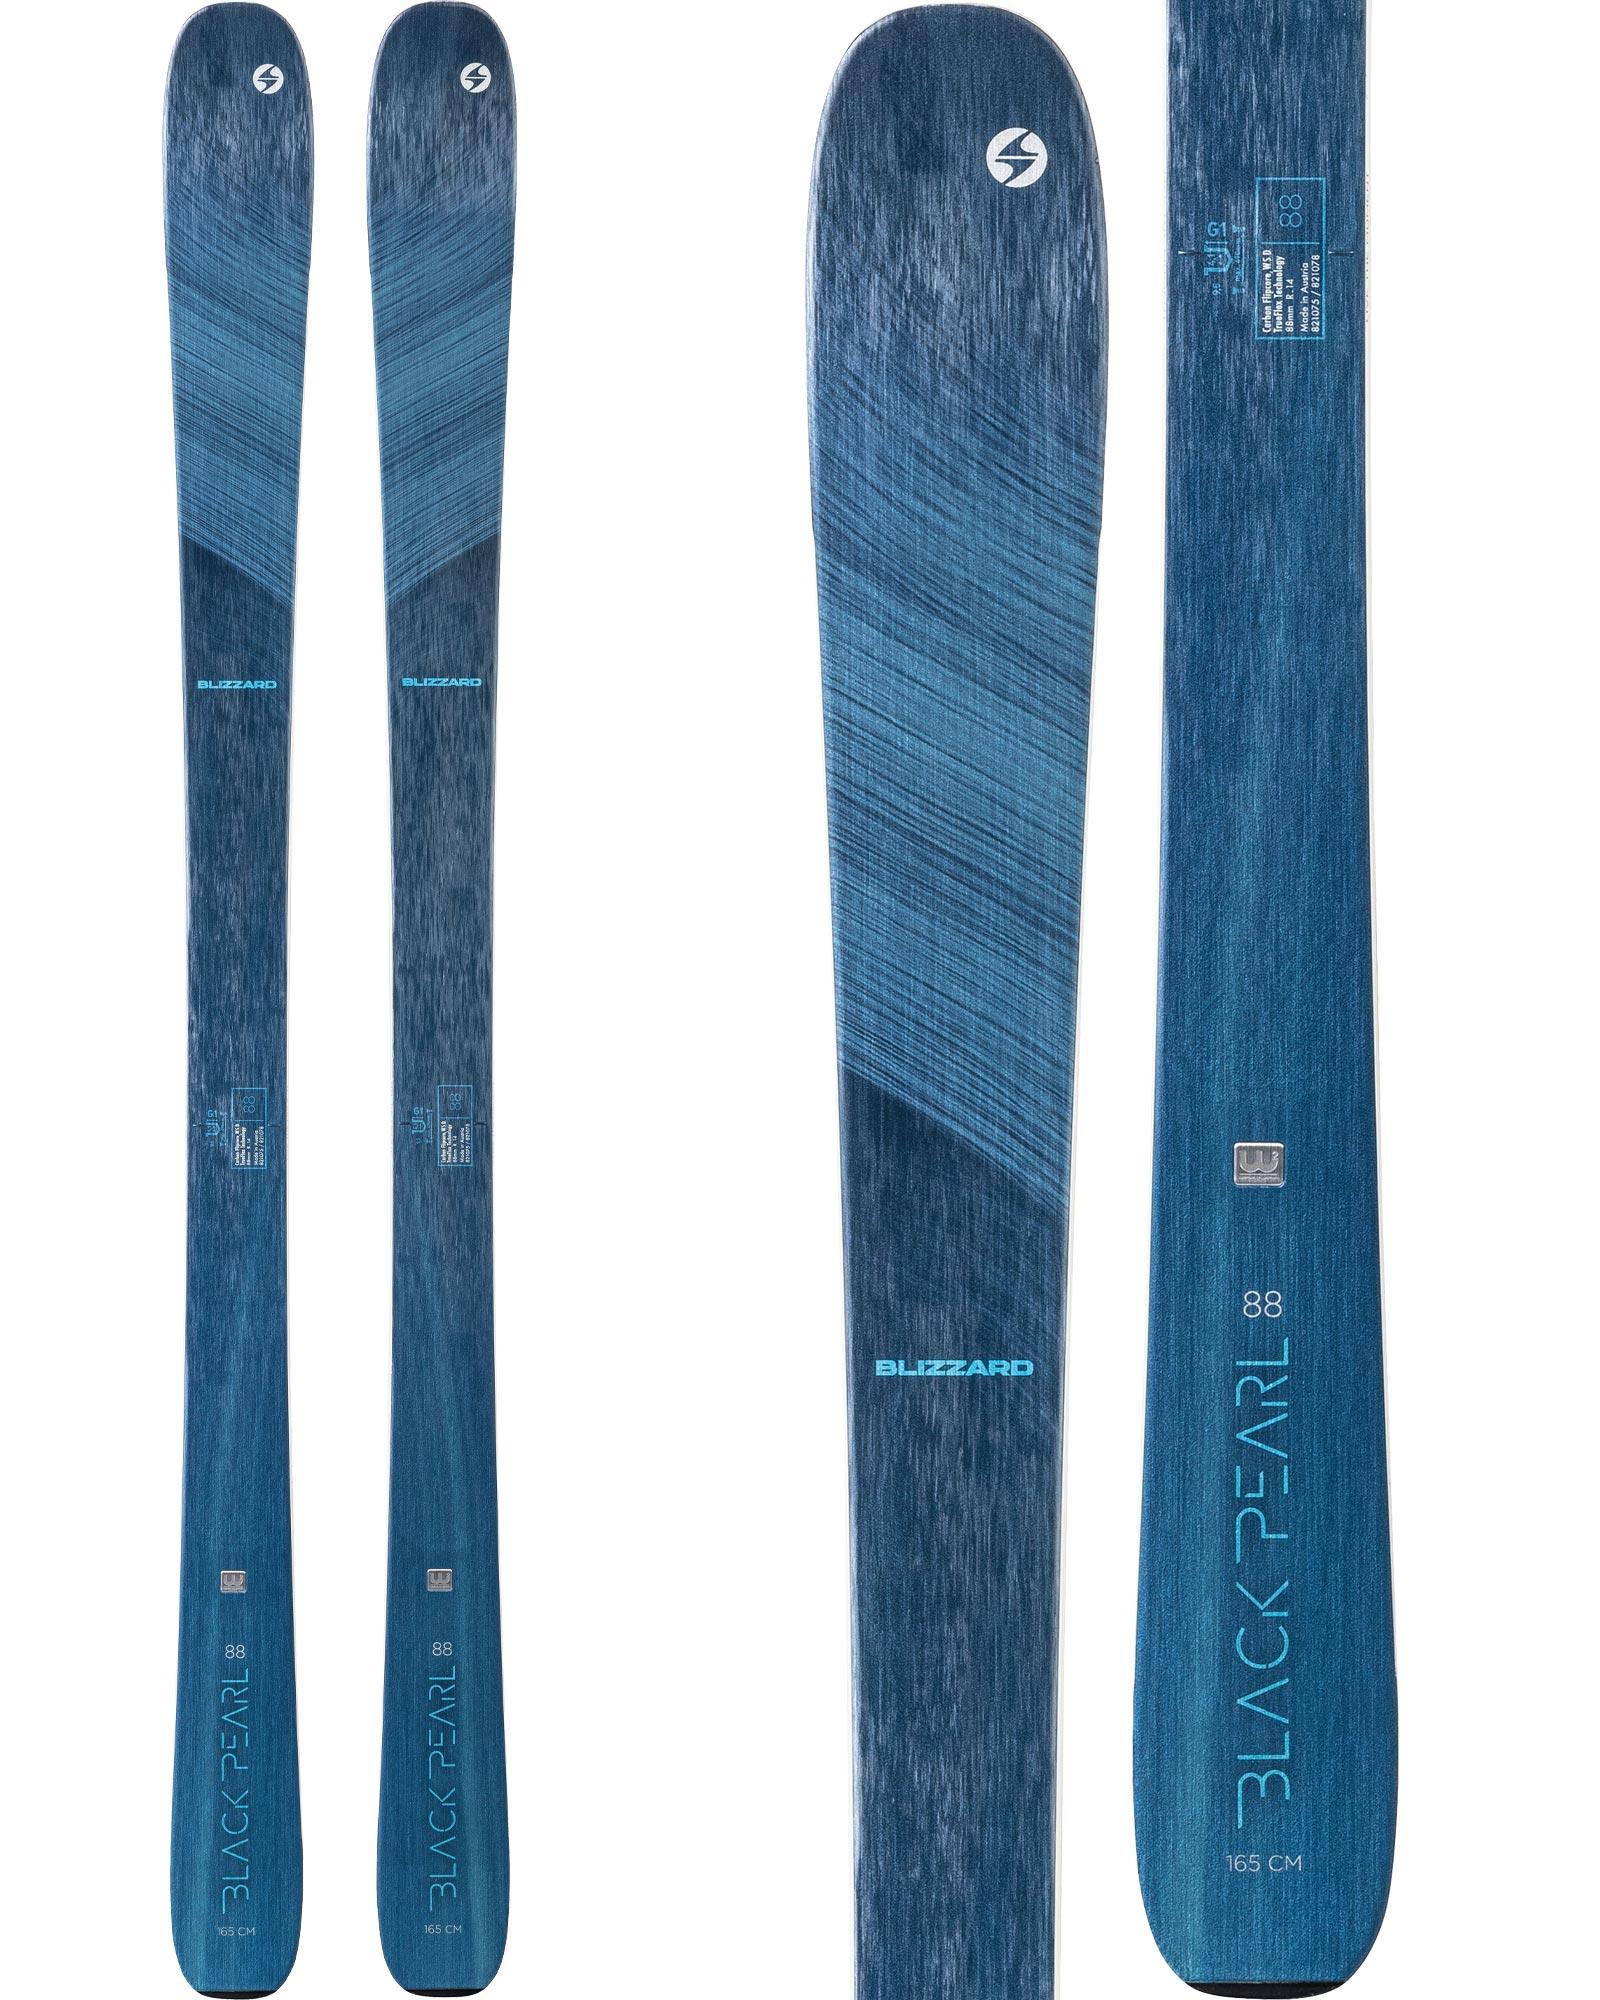 Blizzard Women's Black Pearl 88 All Mountain Skis 2020 / 2021 0